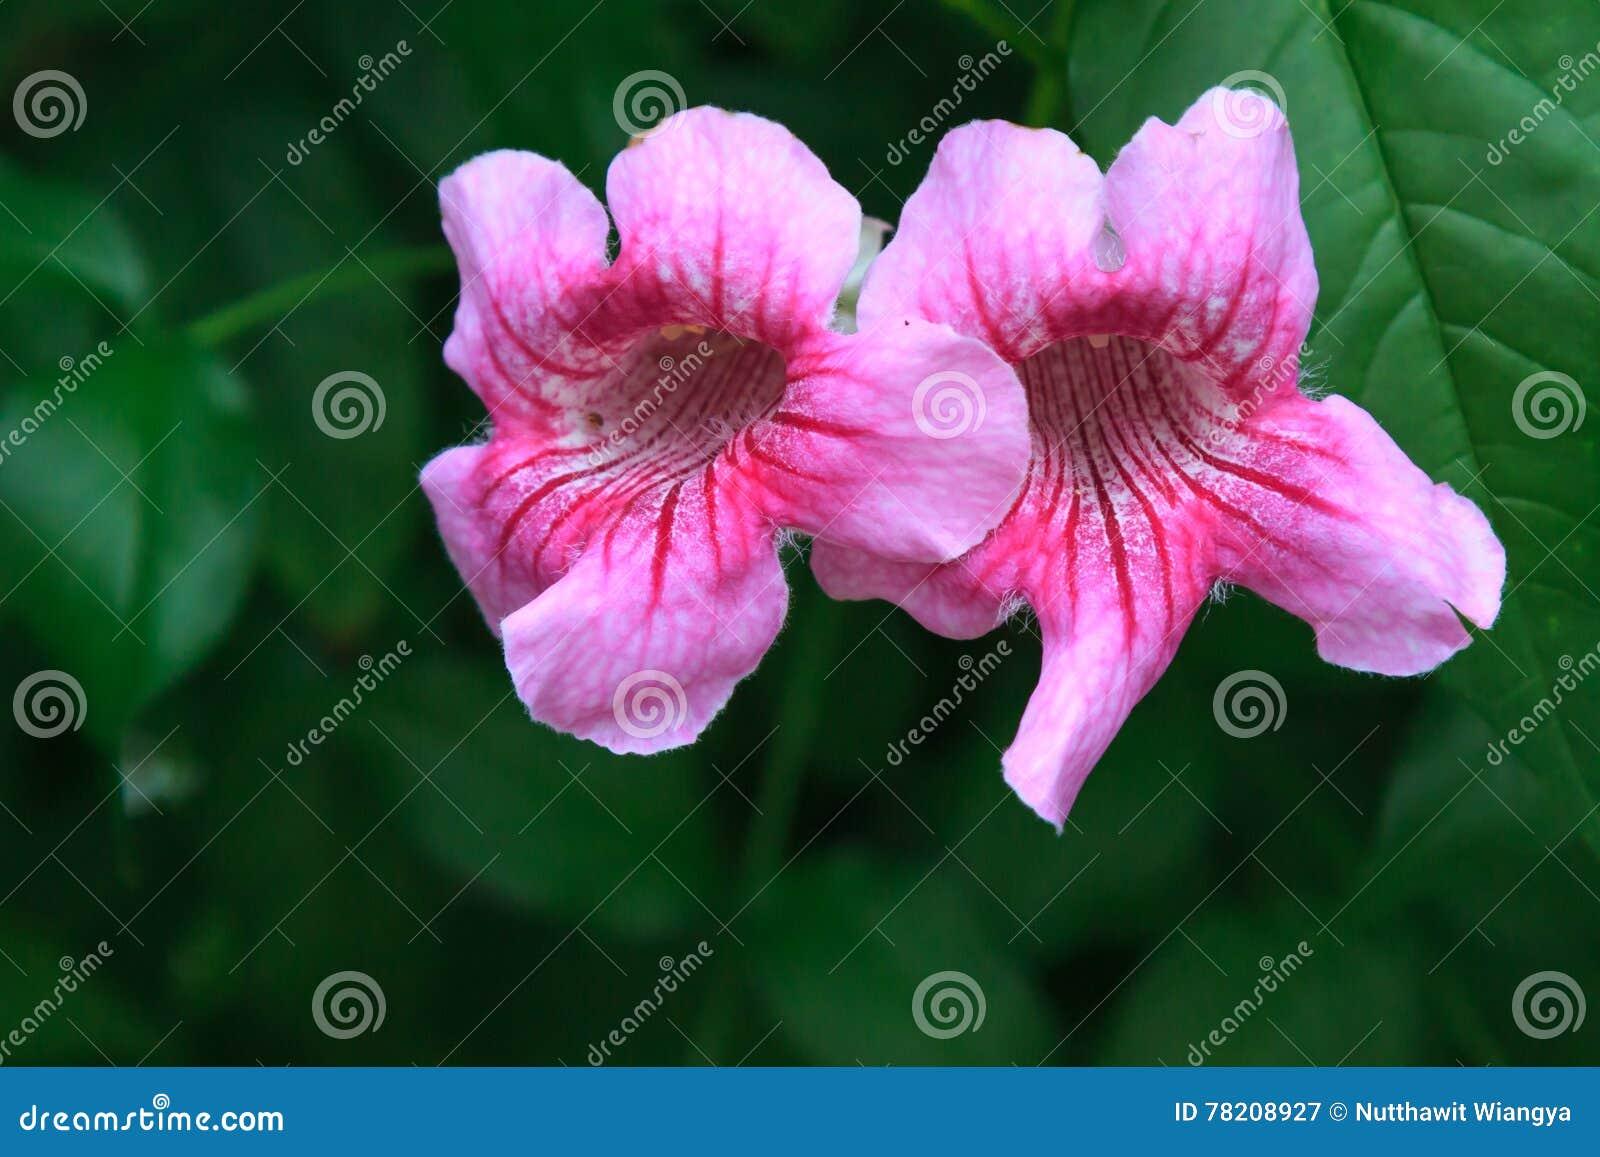 Pink trumpet vine flower stock image image of background 78208927 pink trumpet vine flower mightylinksfo